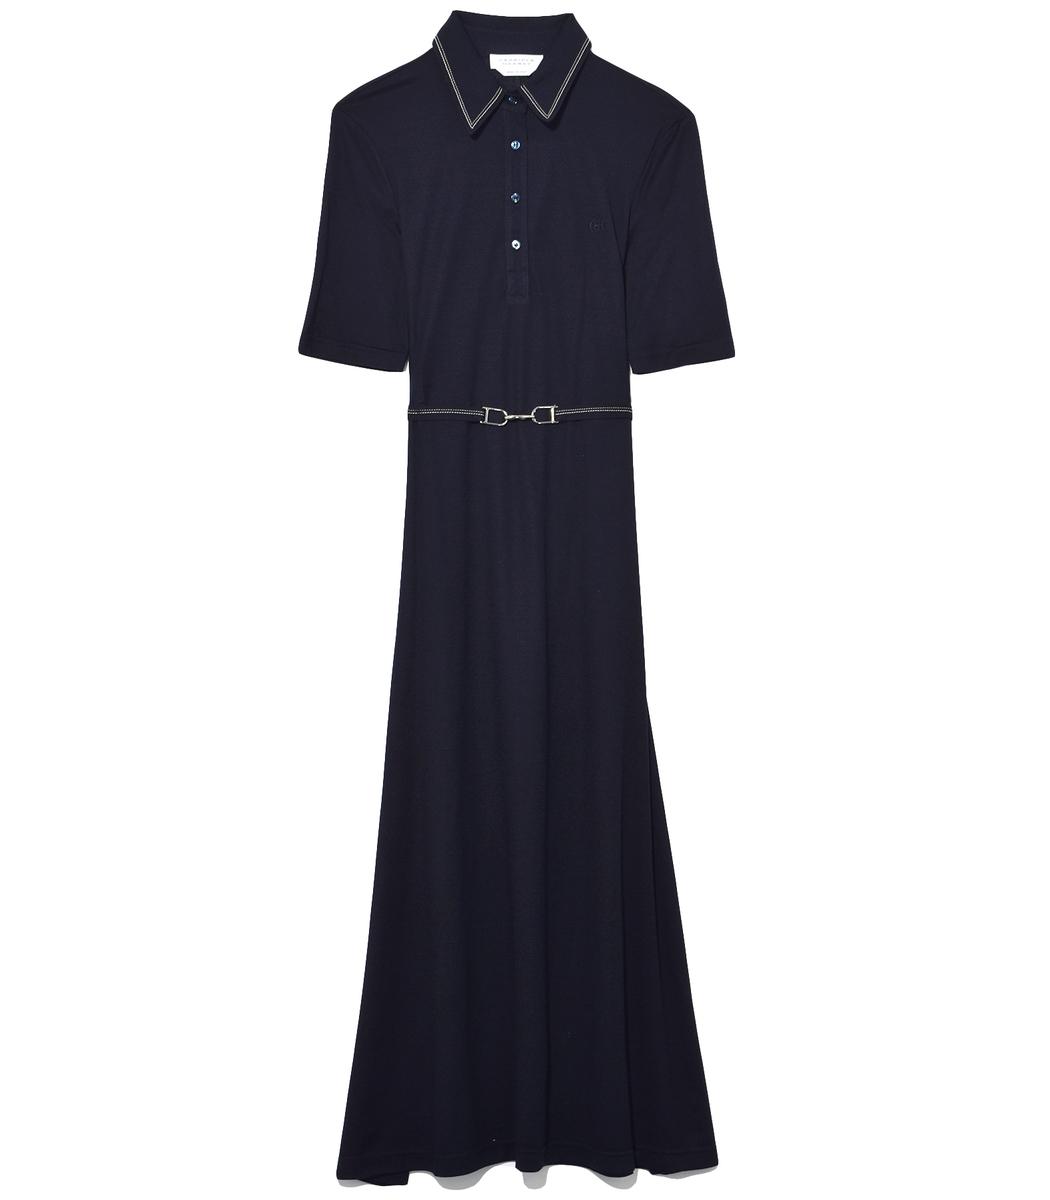 Navy Jean Dress